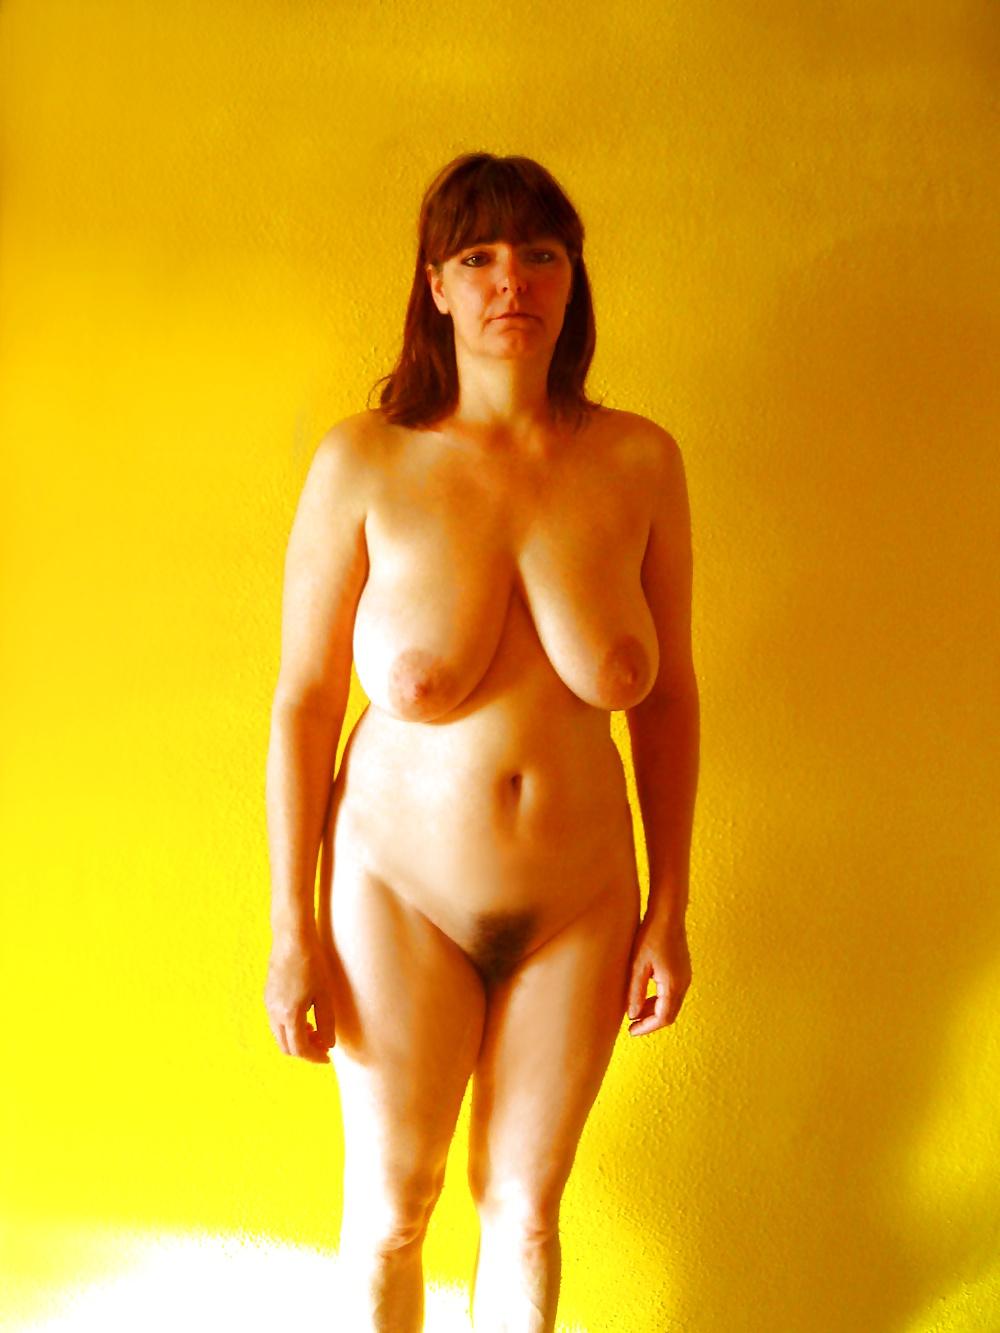 Best boobs amazing huge saggy long perfect boobs women